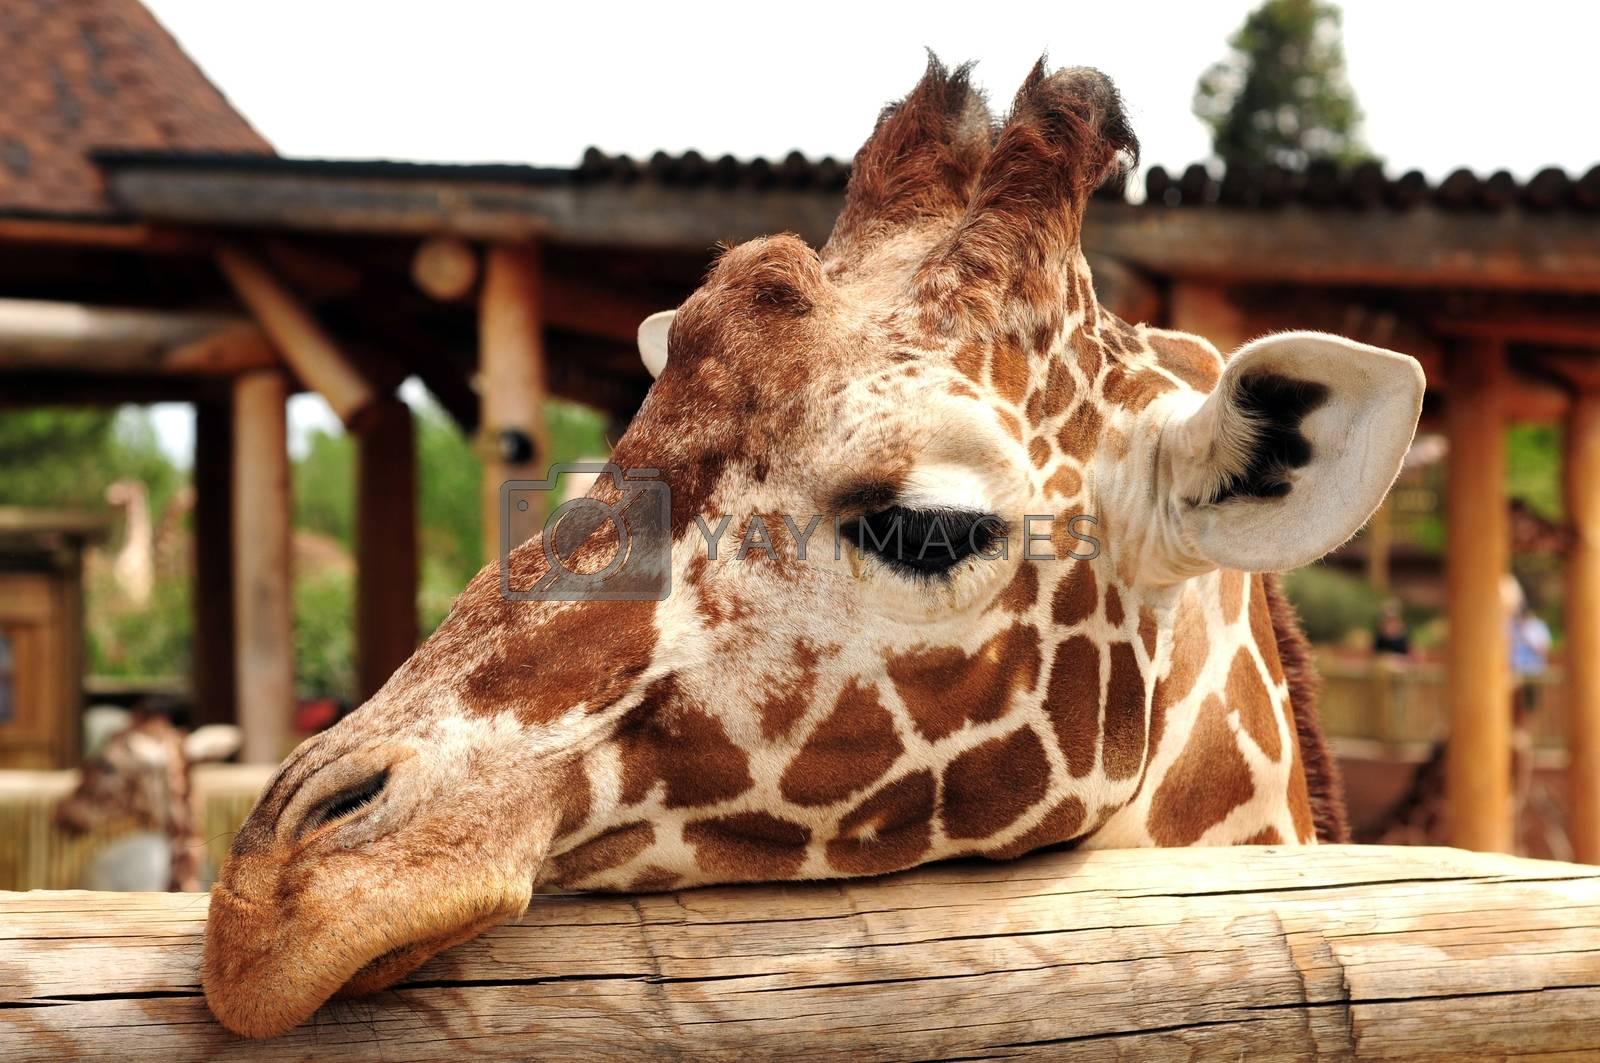 Giraffe Head in Zoo. (Giraffa Camelopardalis) African Animals Photo Collection.